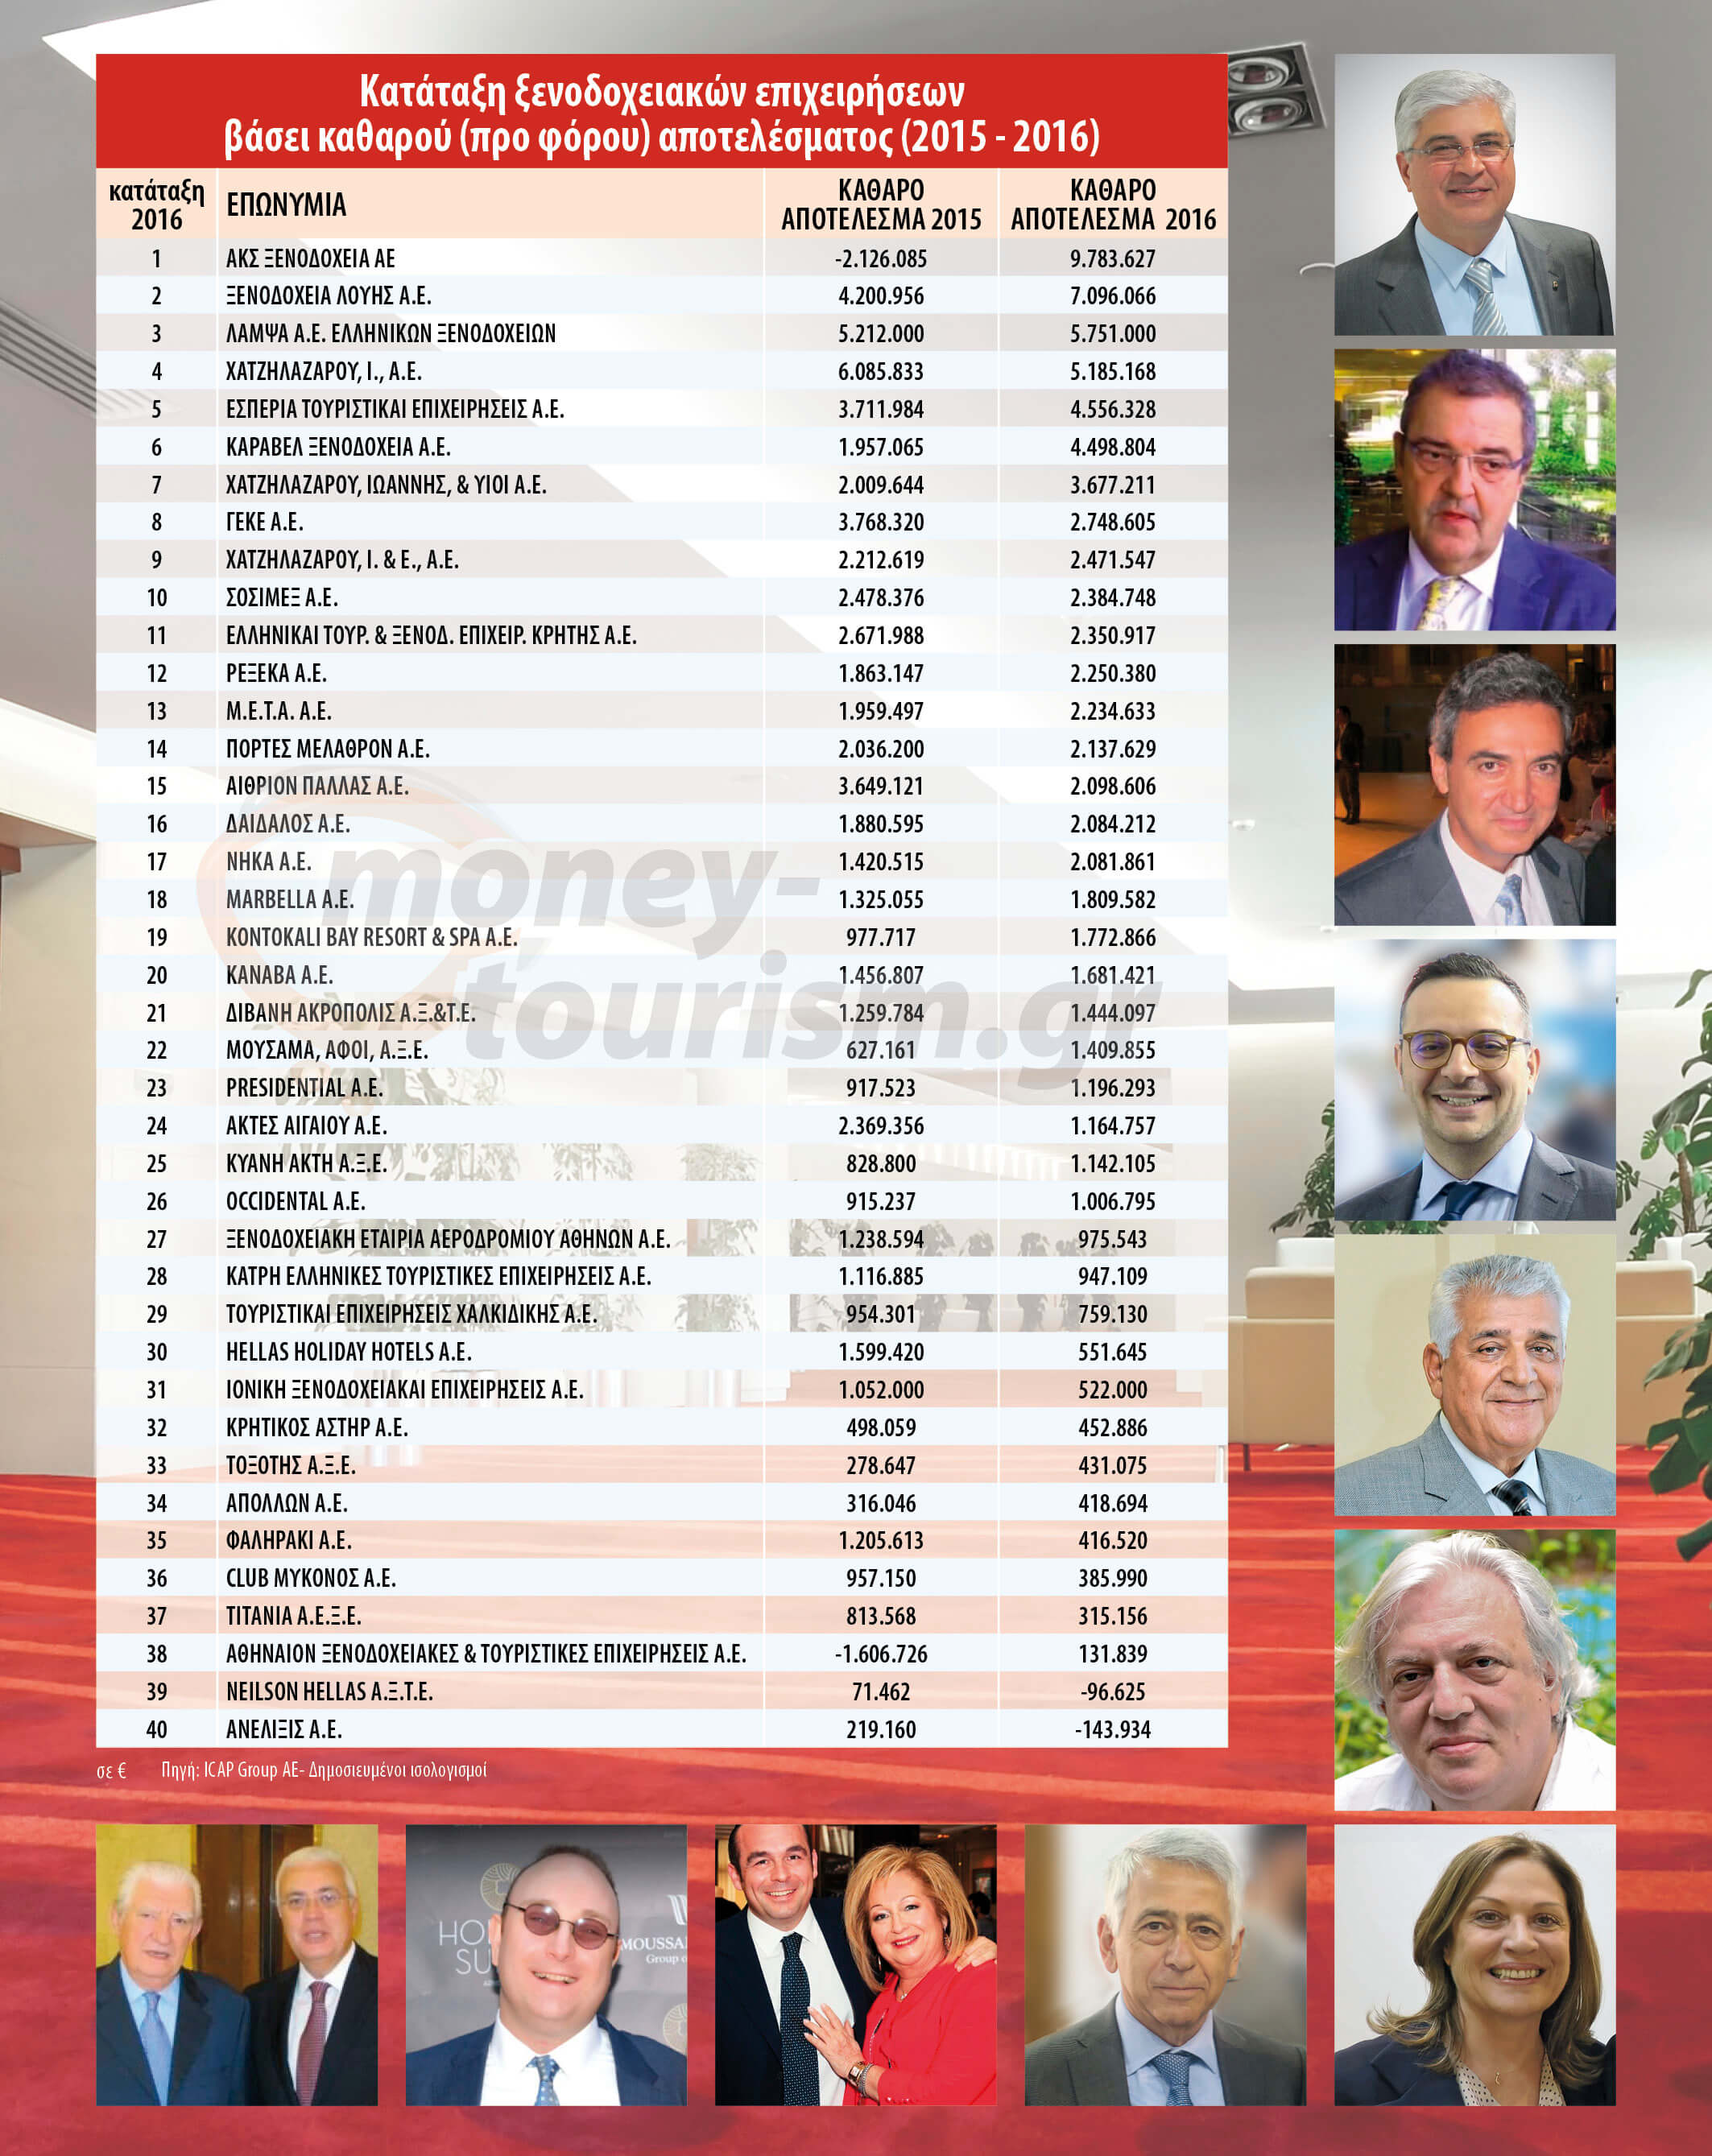 icap. Την λίστα με τις 40 πλέον κερδοφόρες ξενοδοχειακές επιχειρήσεις στην  Ελλάδα ... 7f2946bb6e8